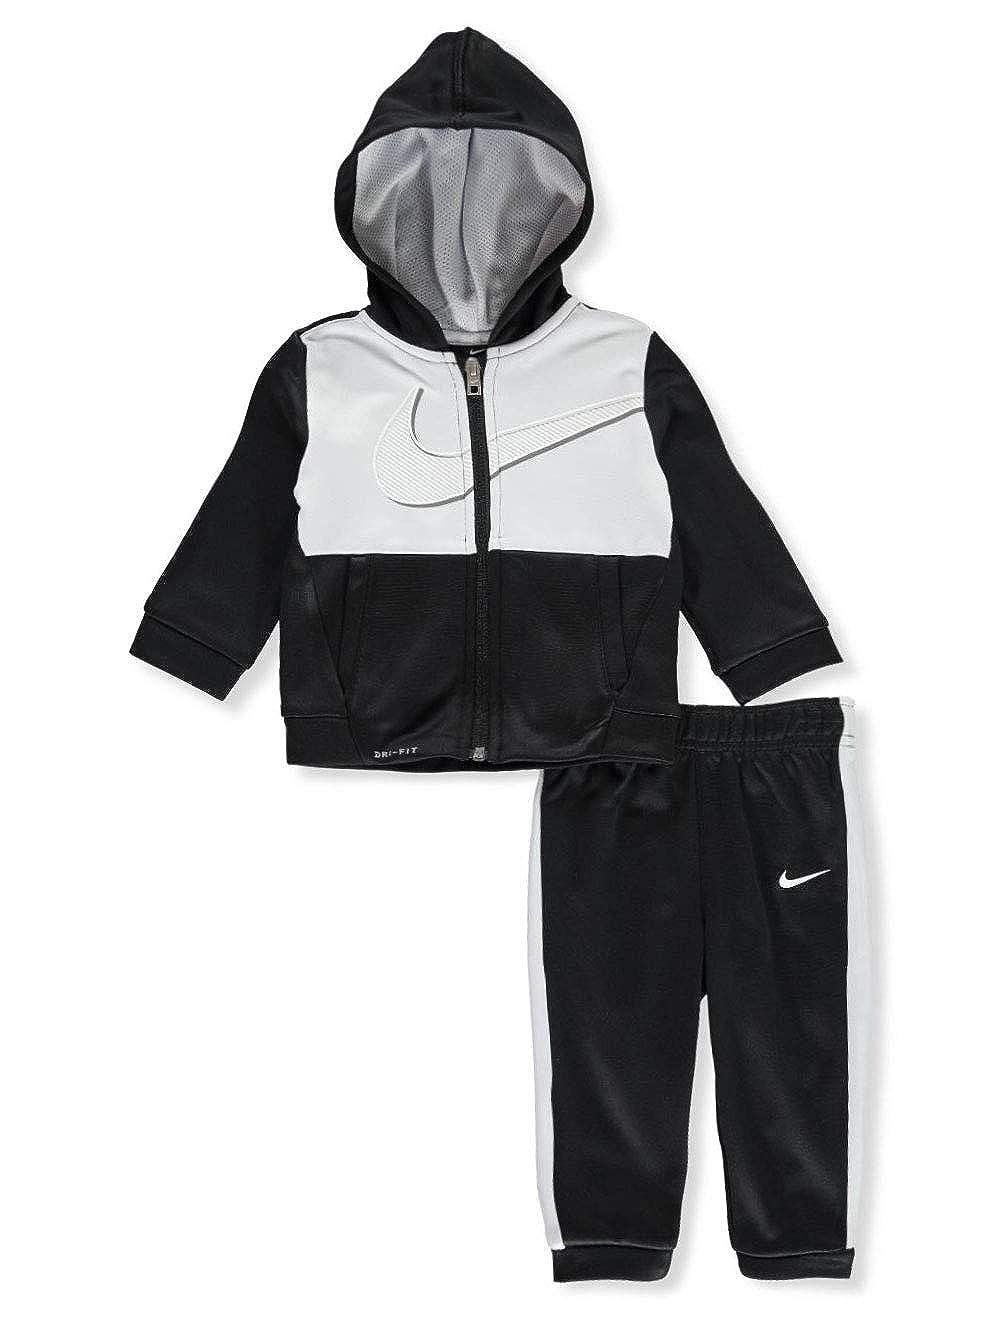 Nike Baby Boys Dri-Fit 2-Piece Tracksuit: Amazon.es: Ropa y ...